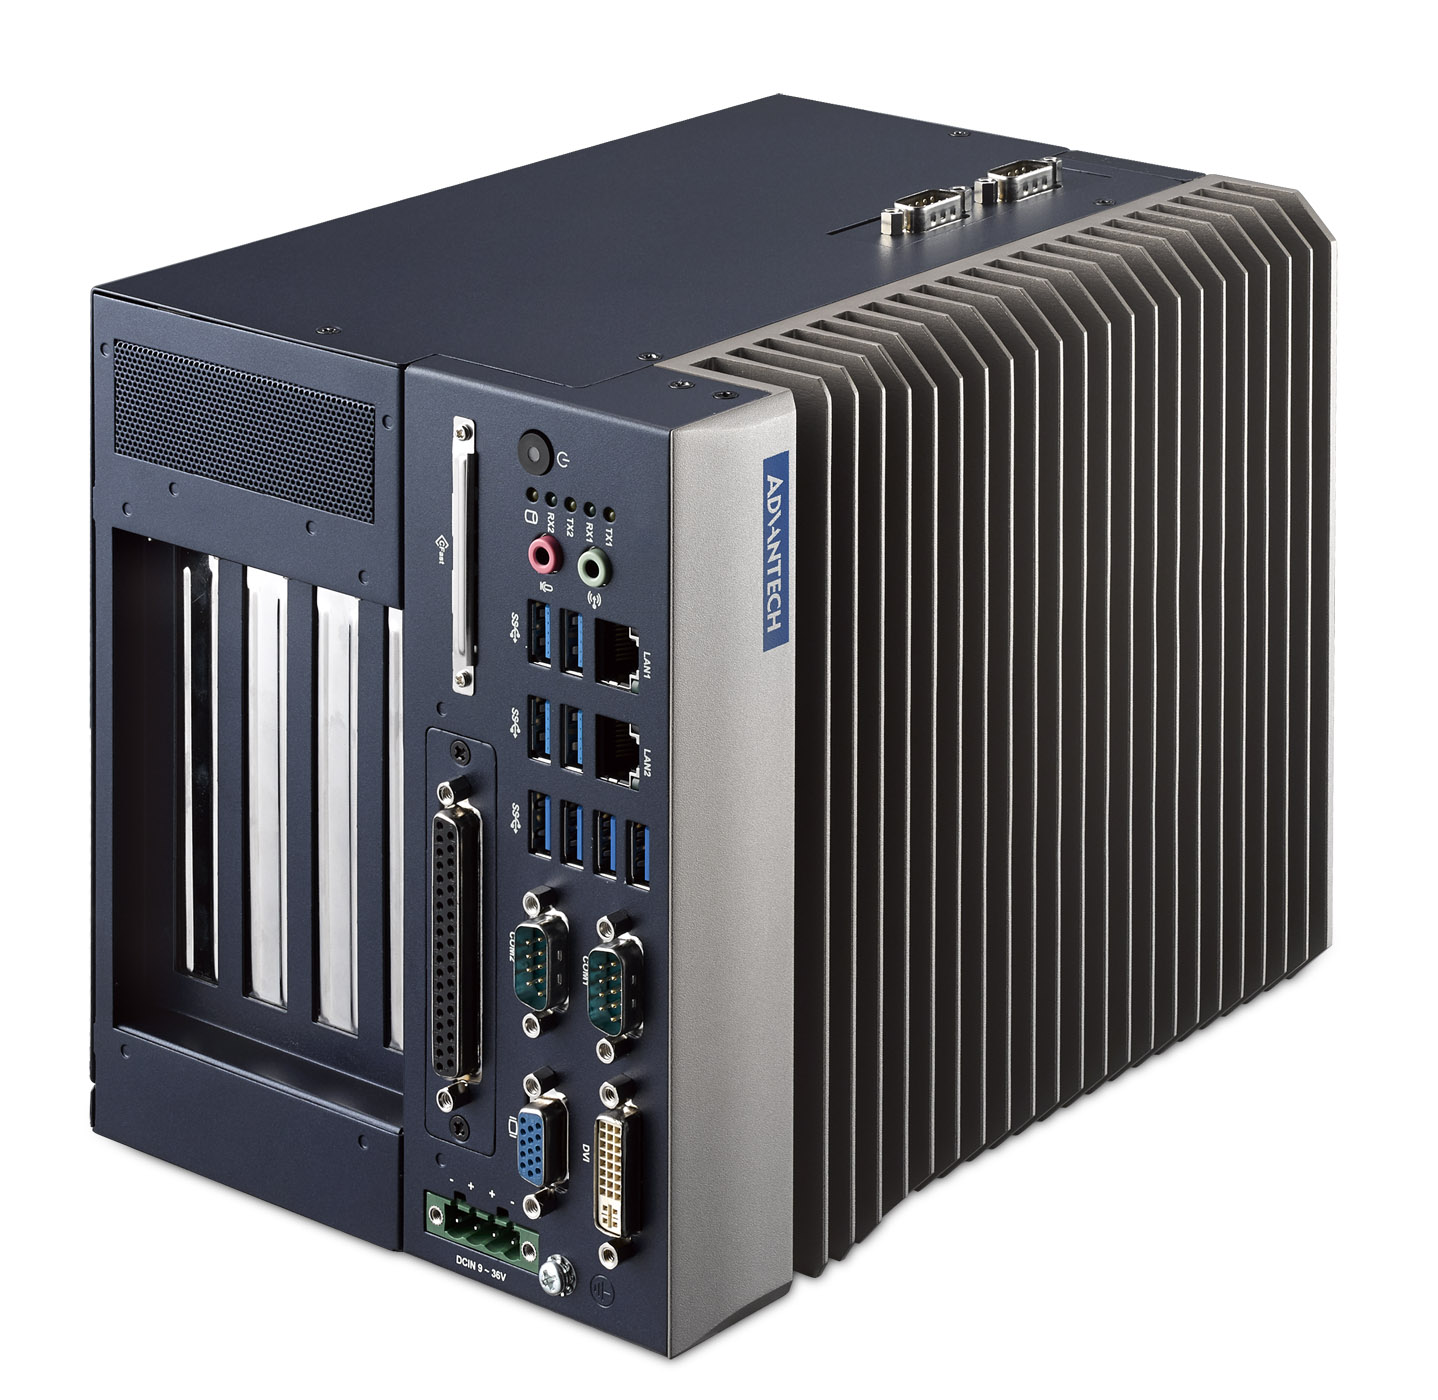 MIC-7700